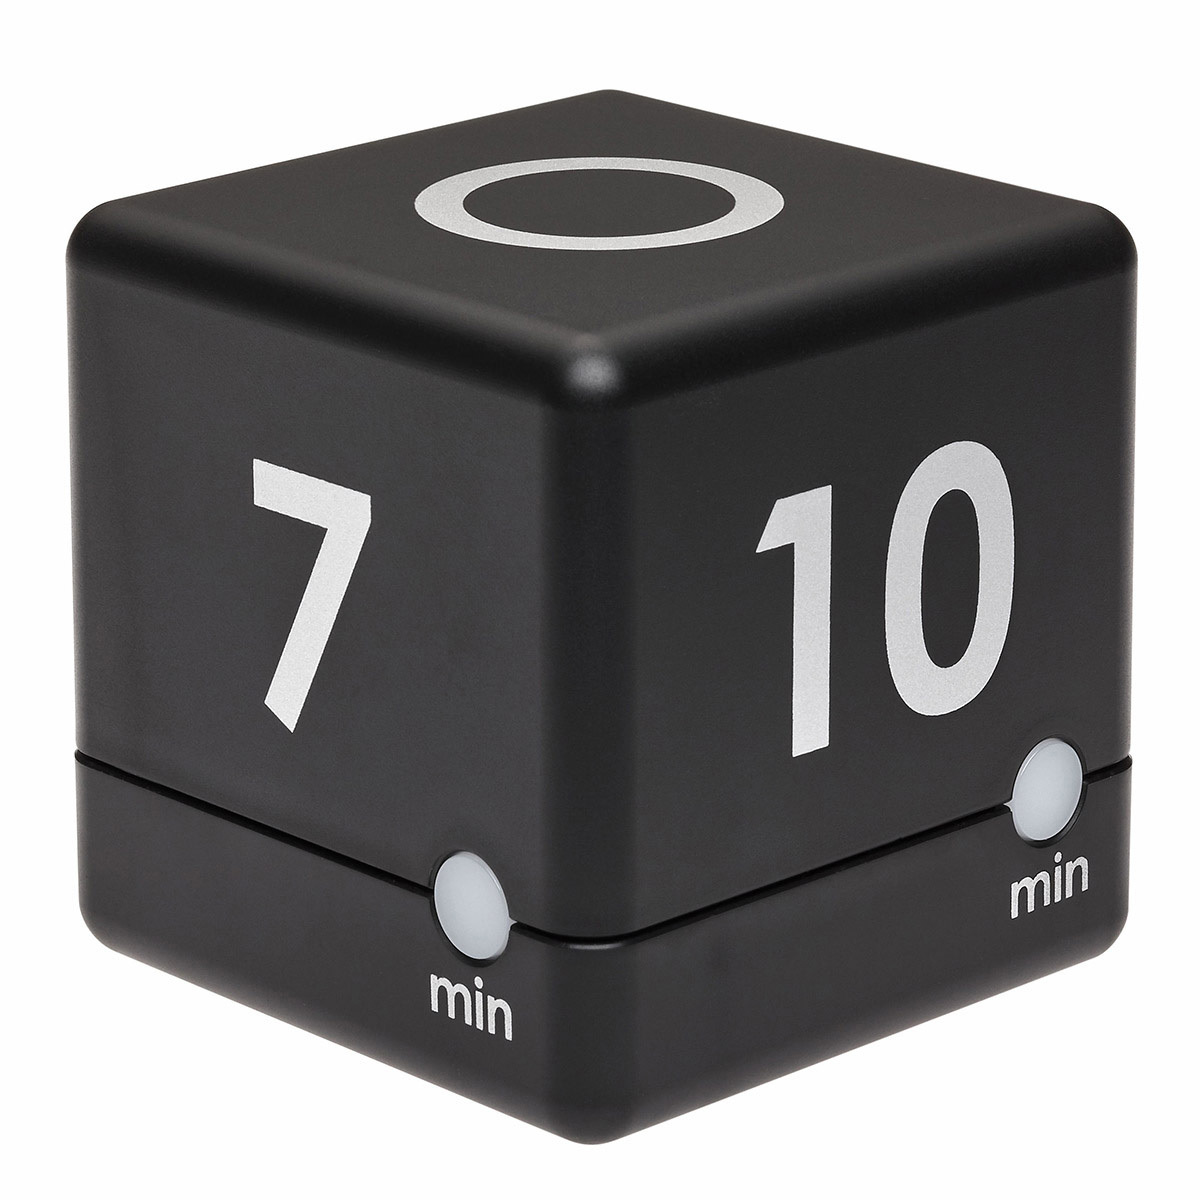 38-2040-01-digitaler-würfel-timer-cube-timer-1200x1200px.jpg